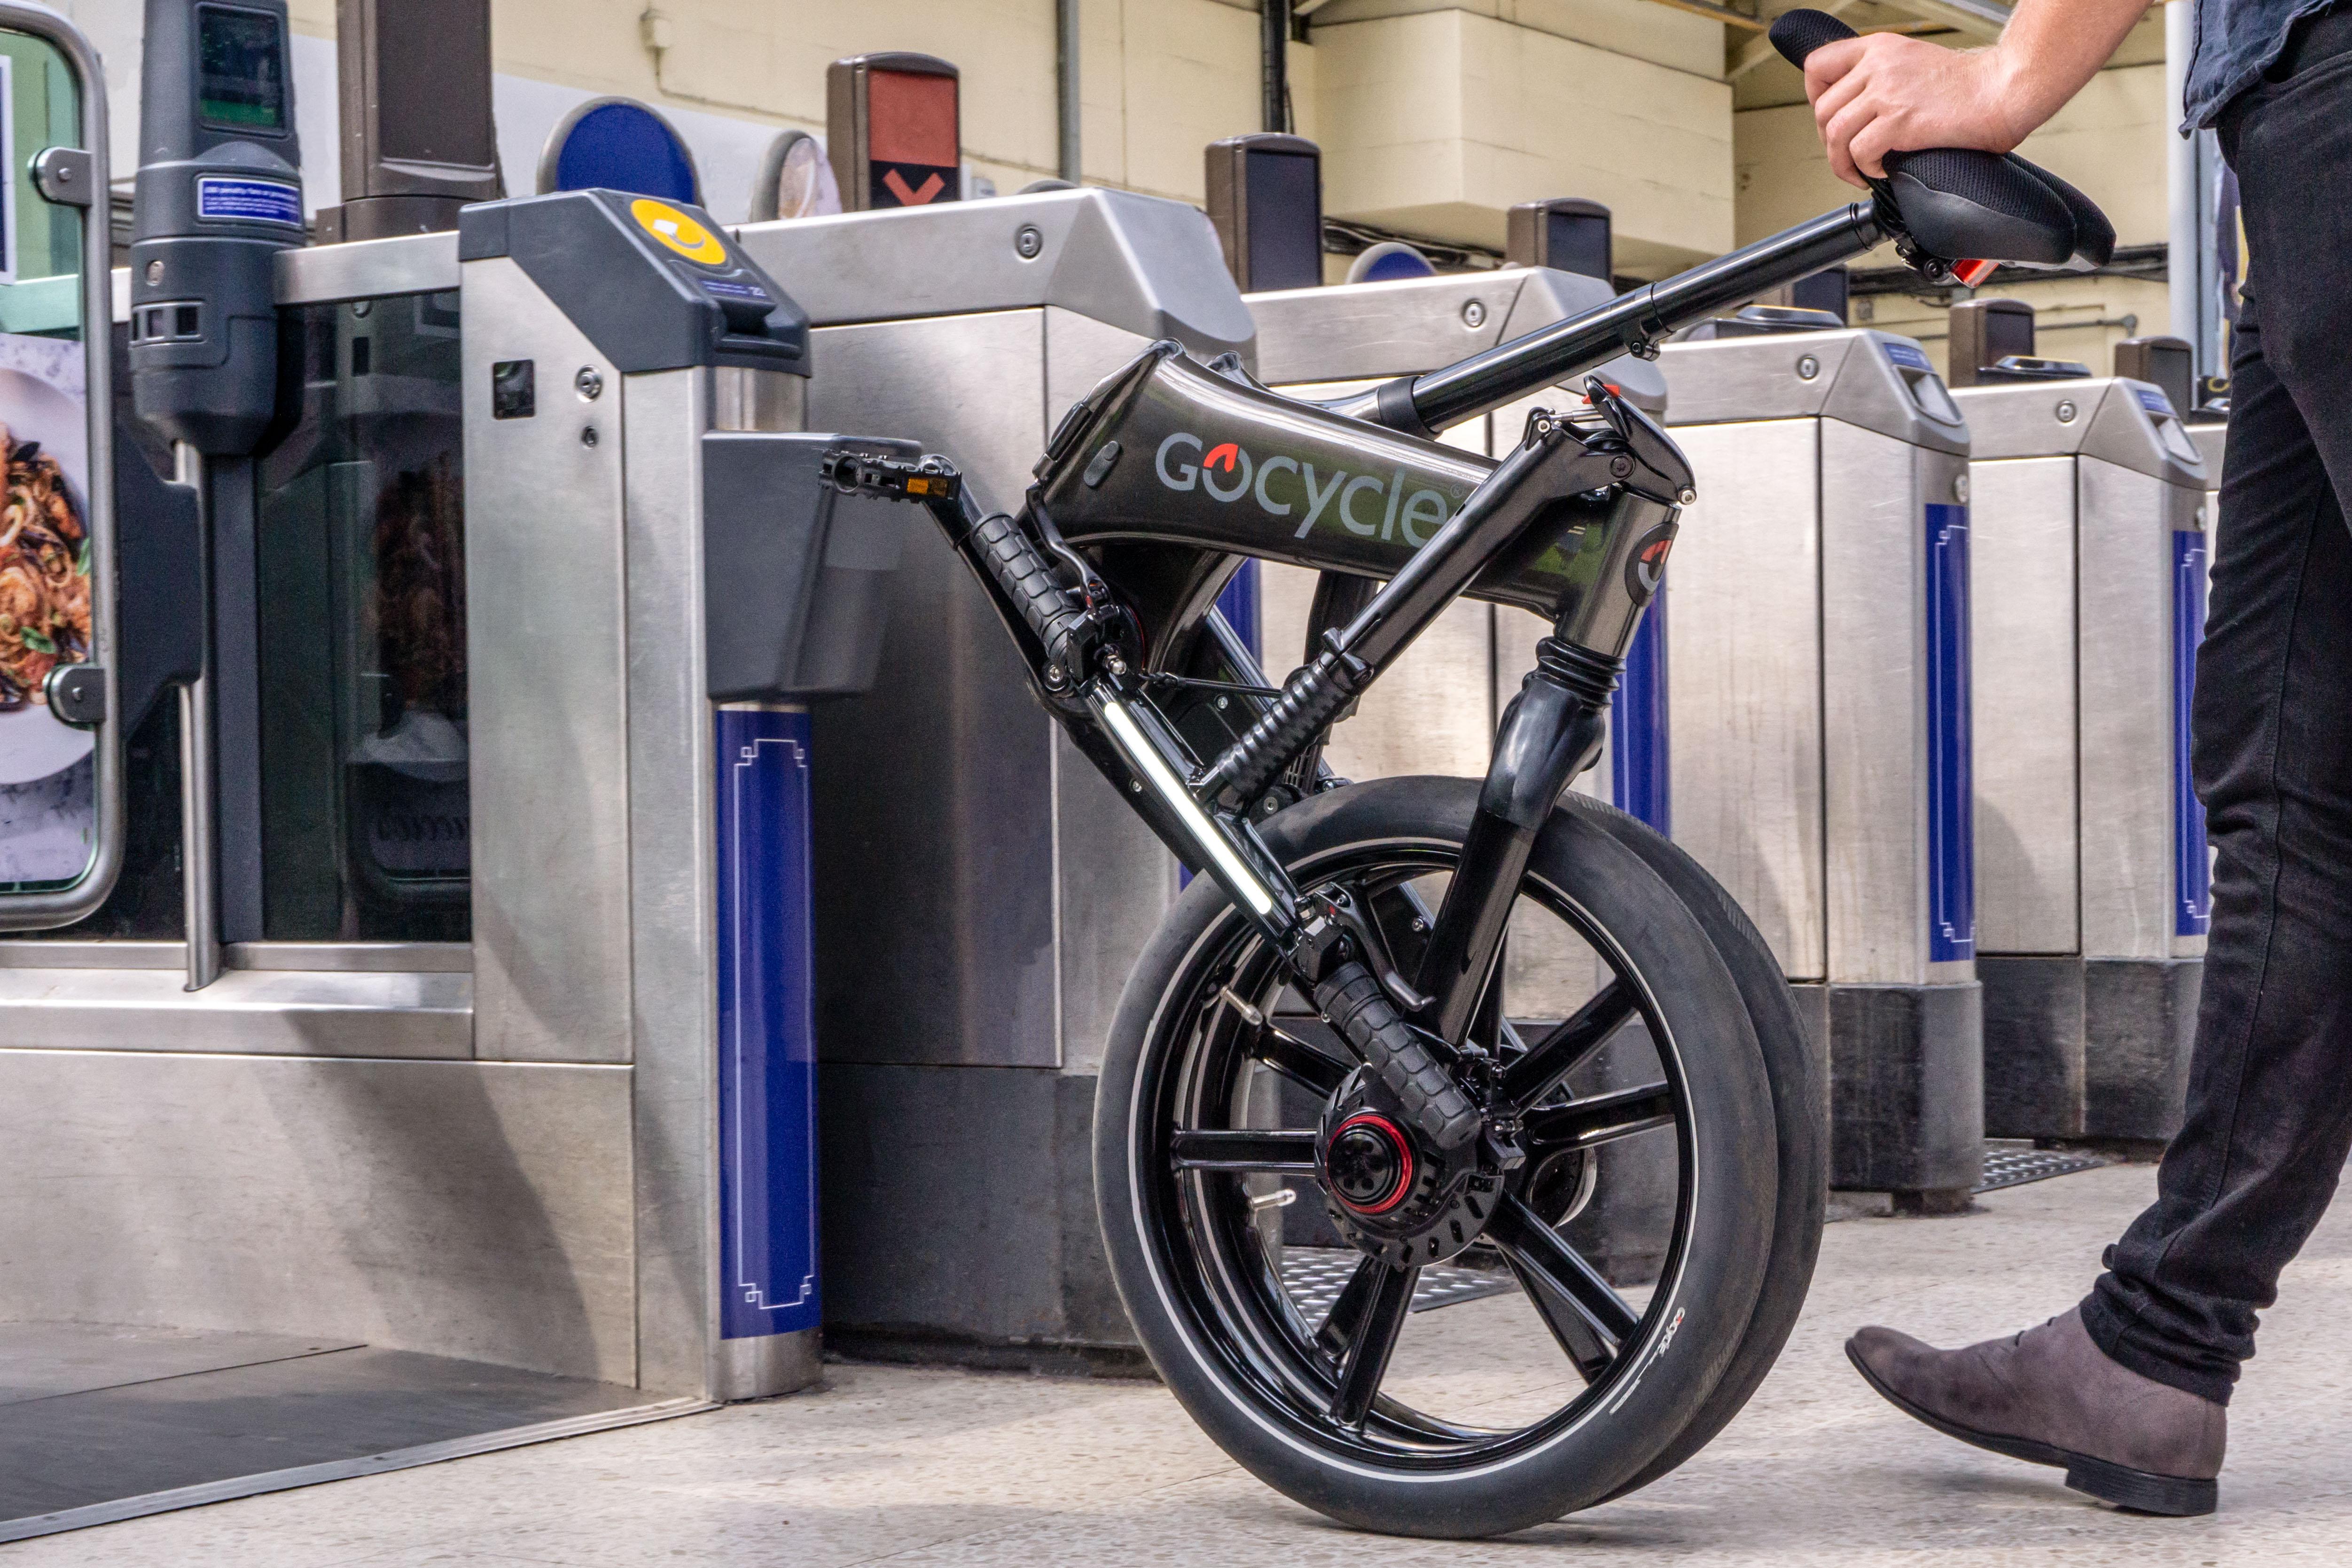 Gocycle GXi-13